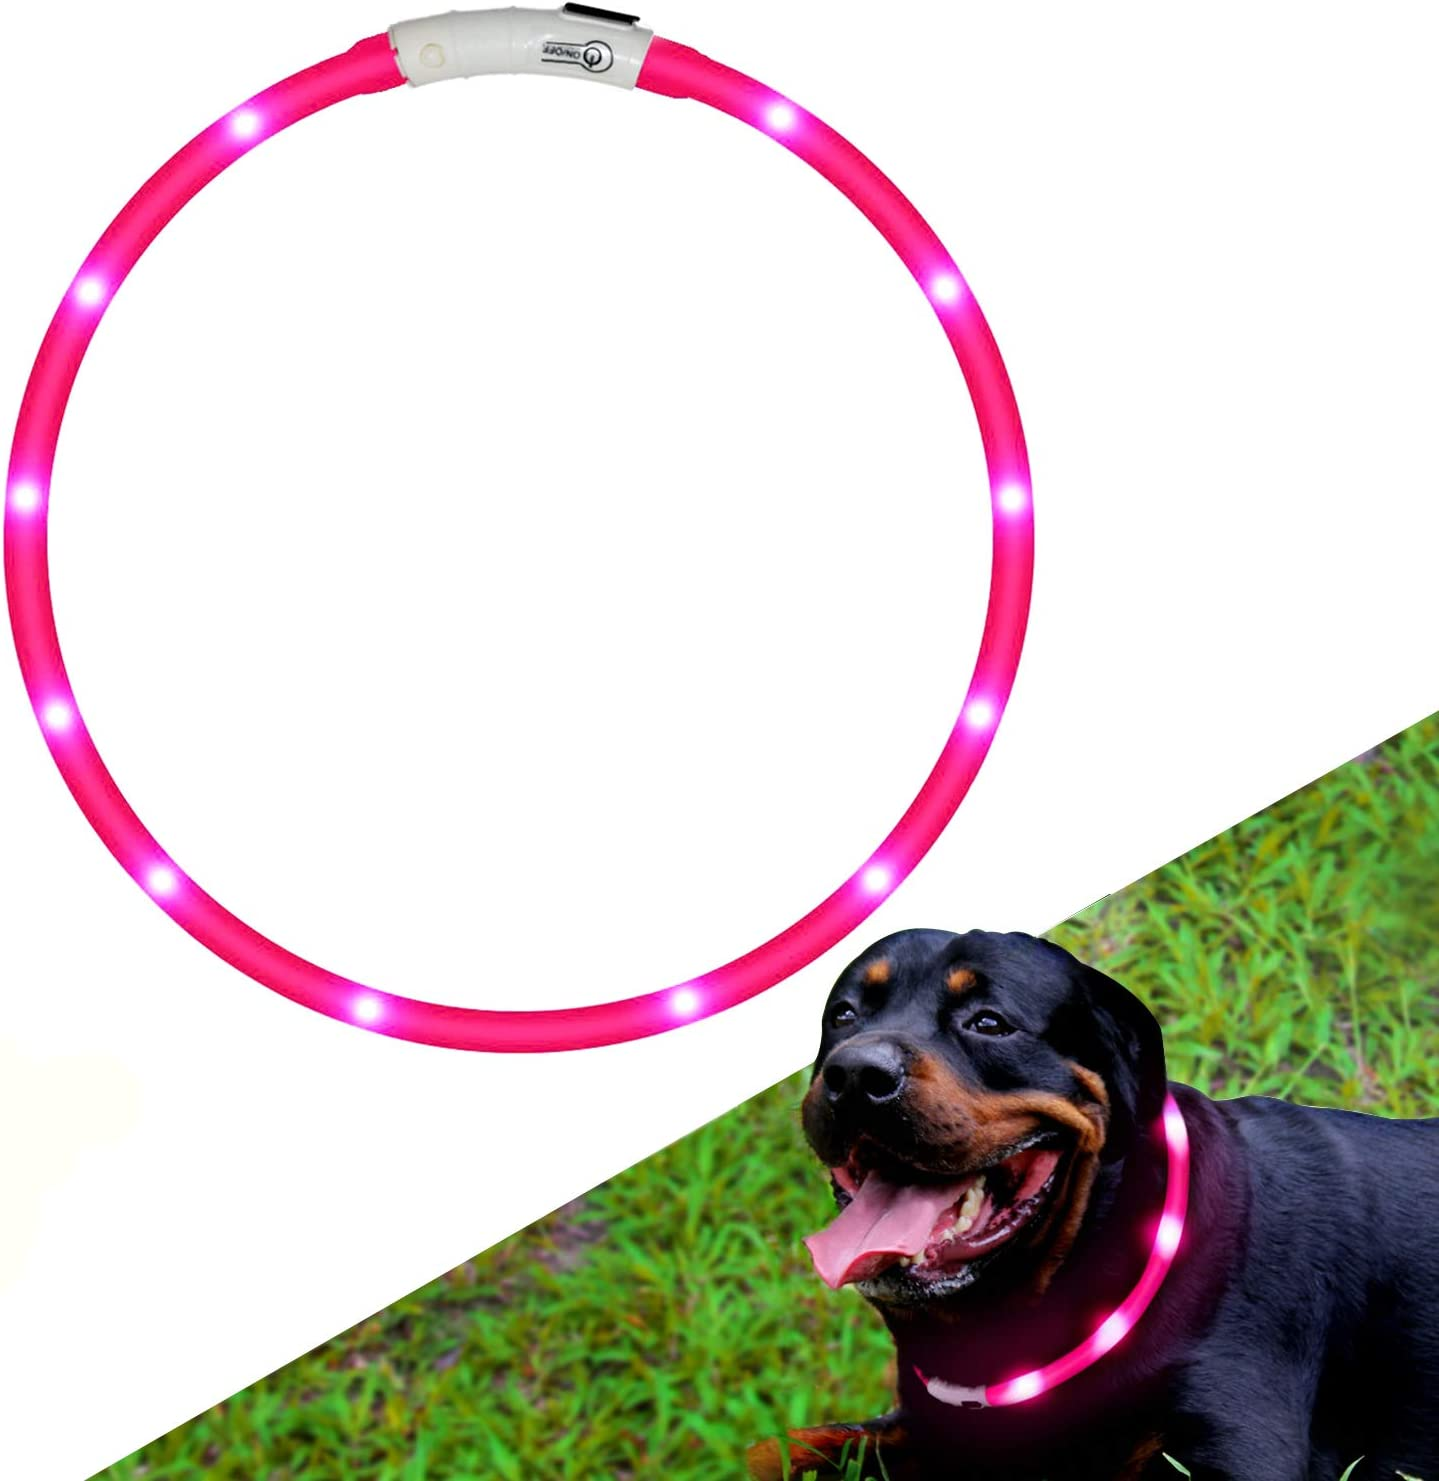 Hunde Leuchthalsband Led Halsband Hundehalsband Hunde Individuell Kürzbar Usb Aufladbar Kabel Im Lieferumfang Enthalten Haustier